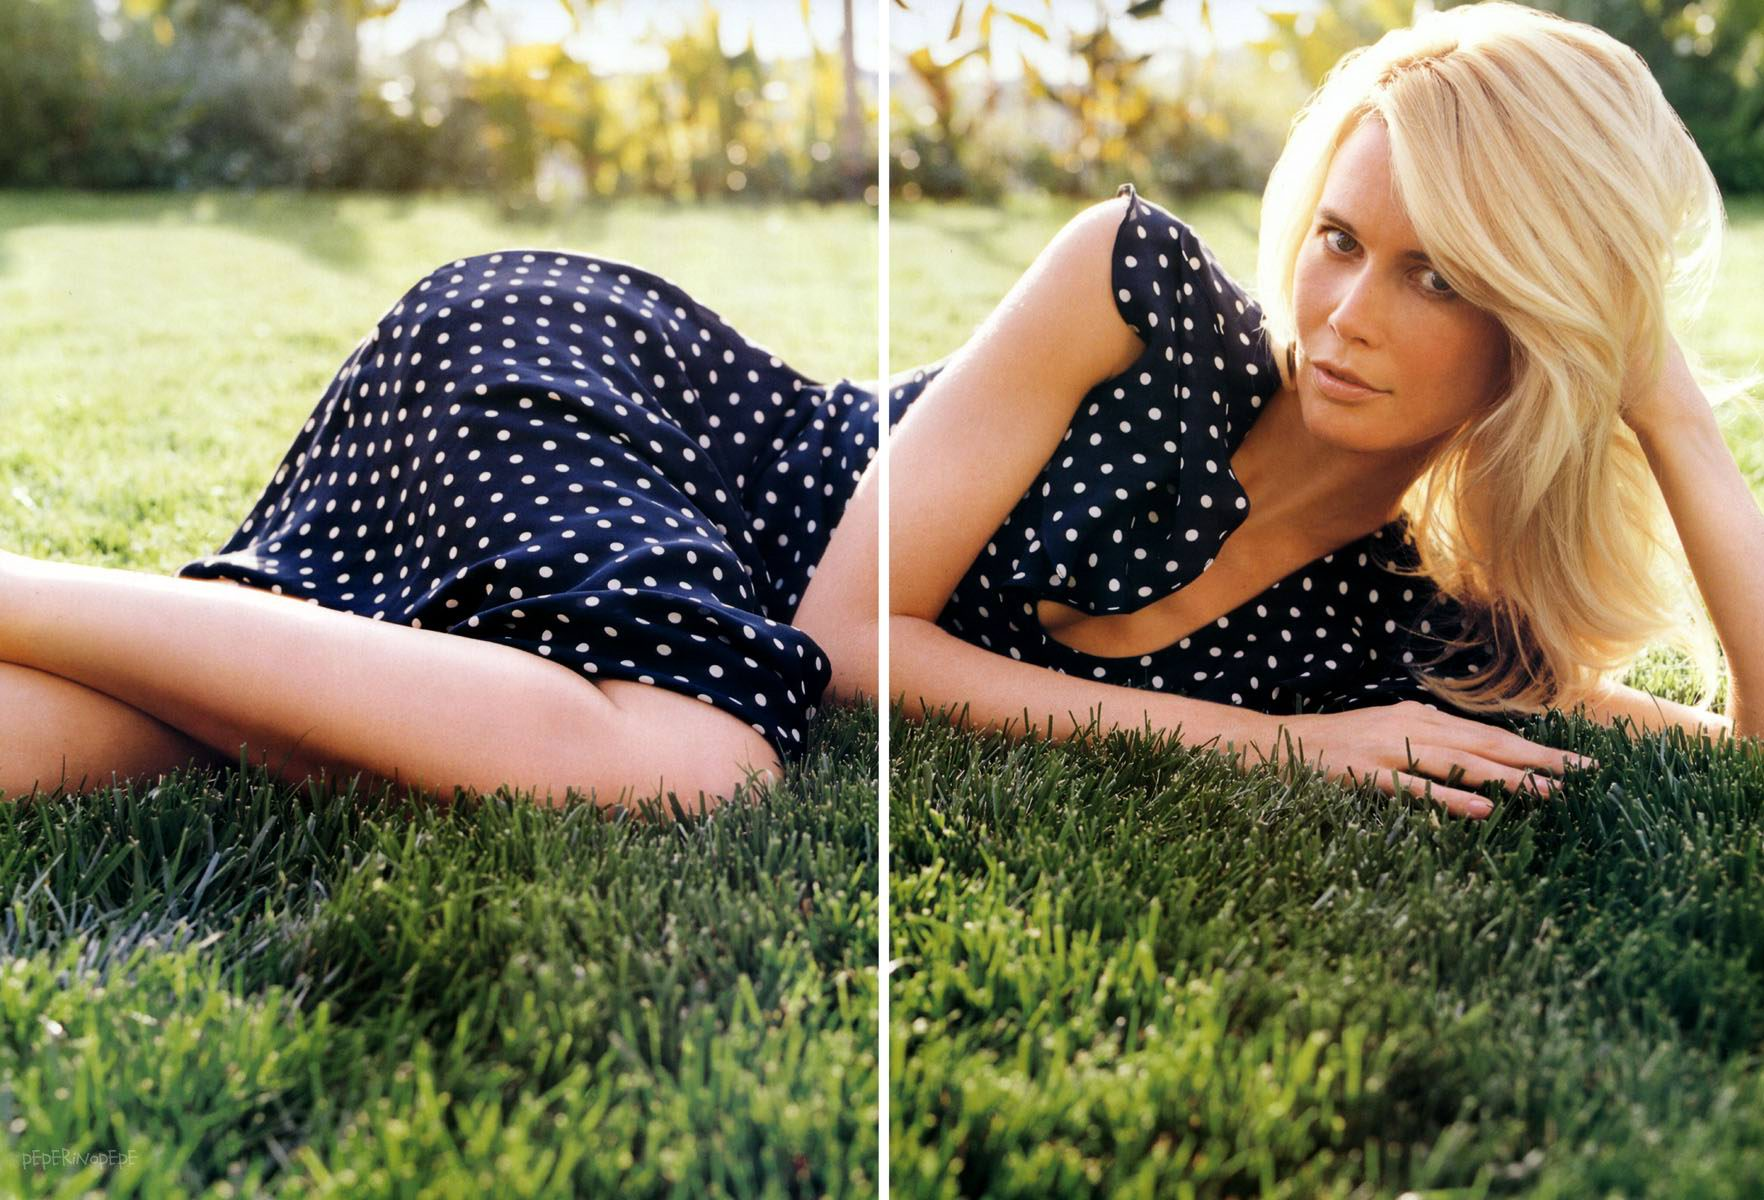 pppp0145_ClaudiaSchifer_VogueUSMar2004